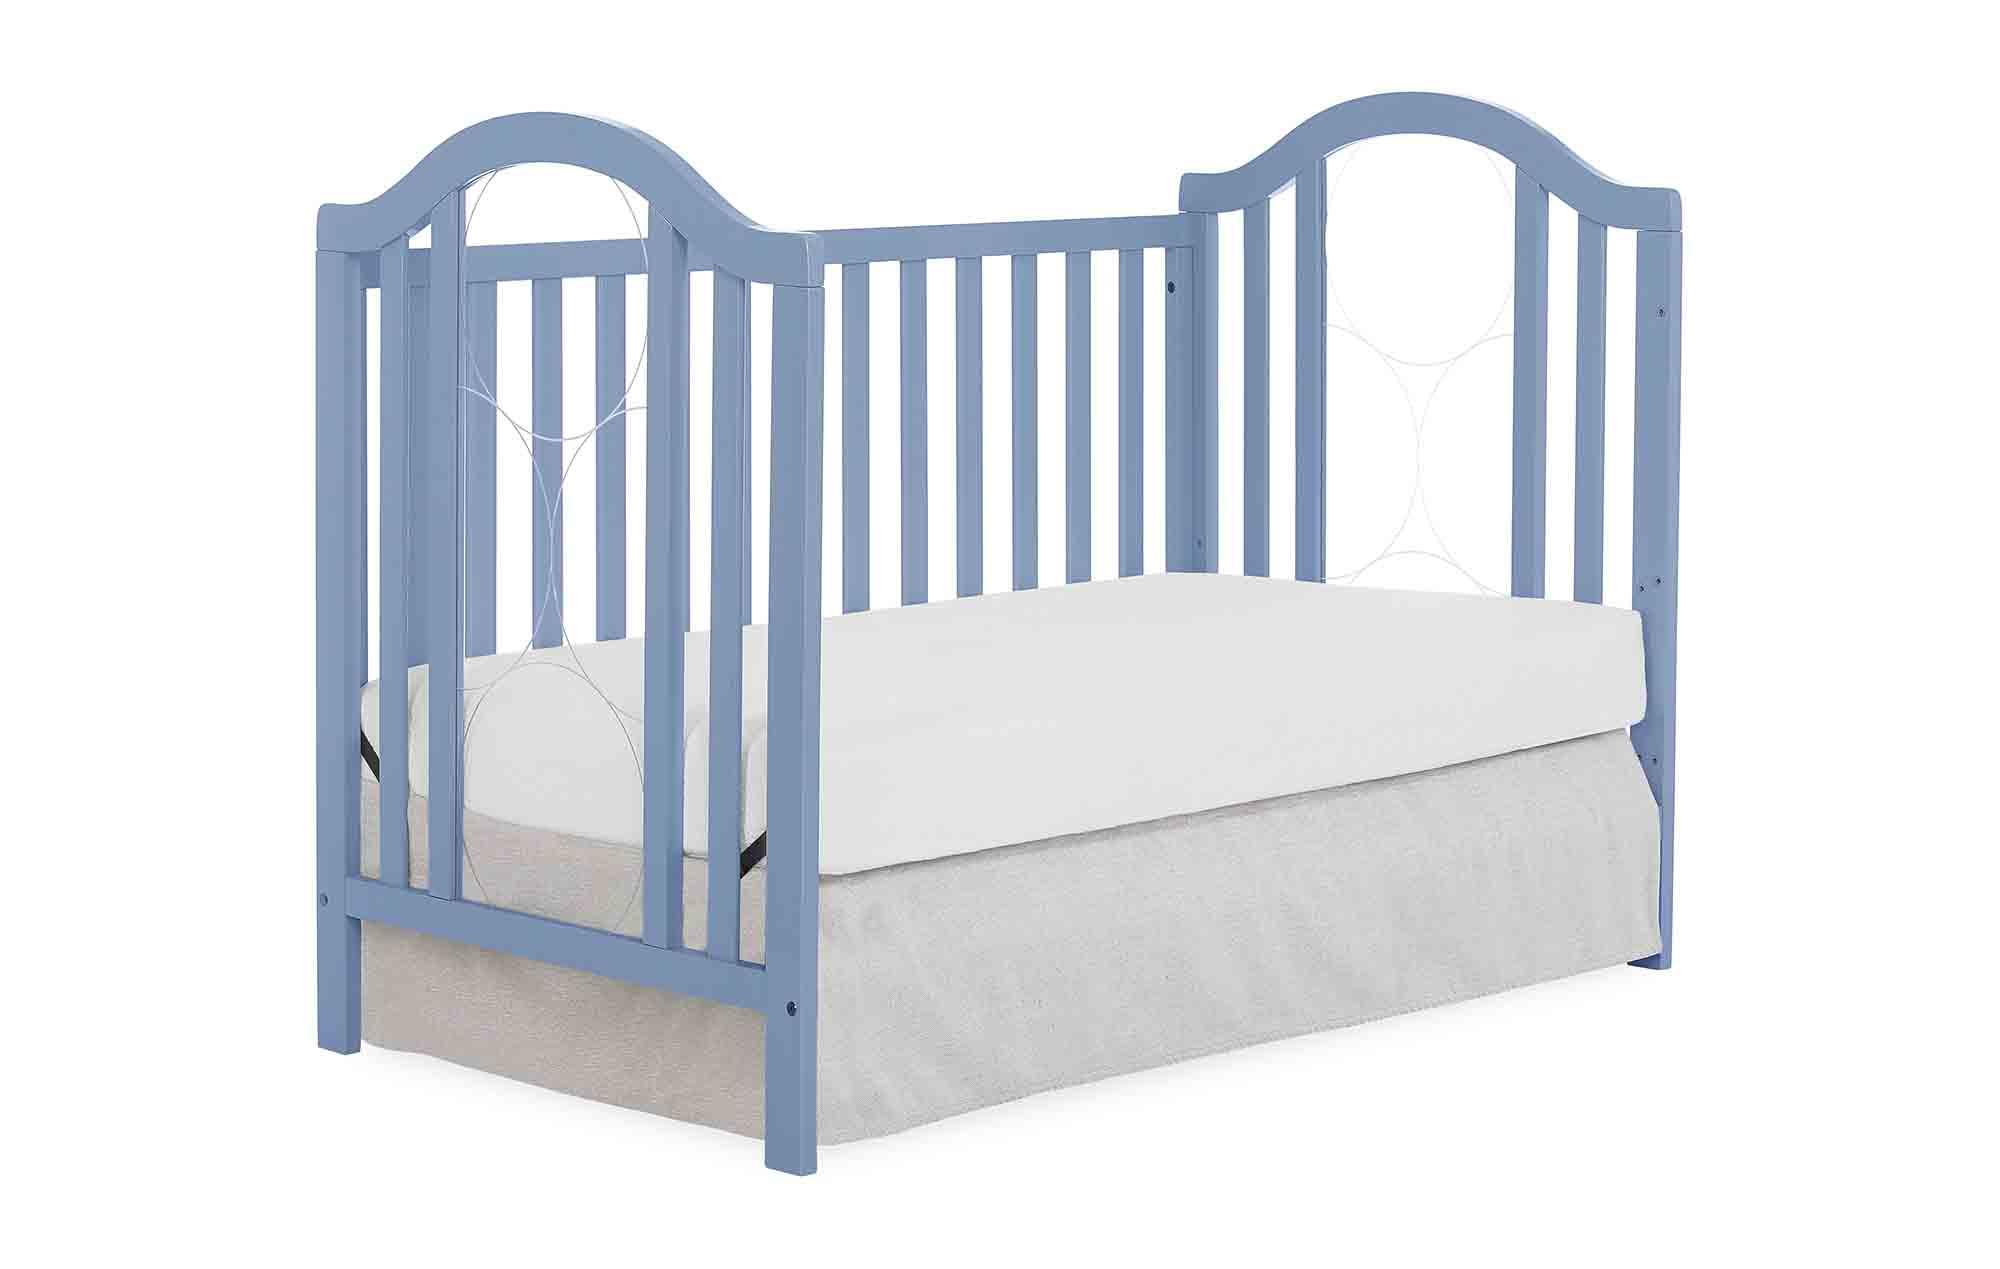 762-DUSB Ariel Day Bed